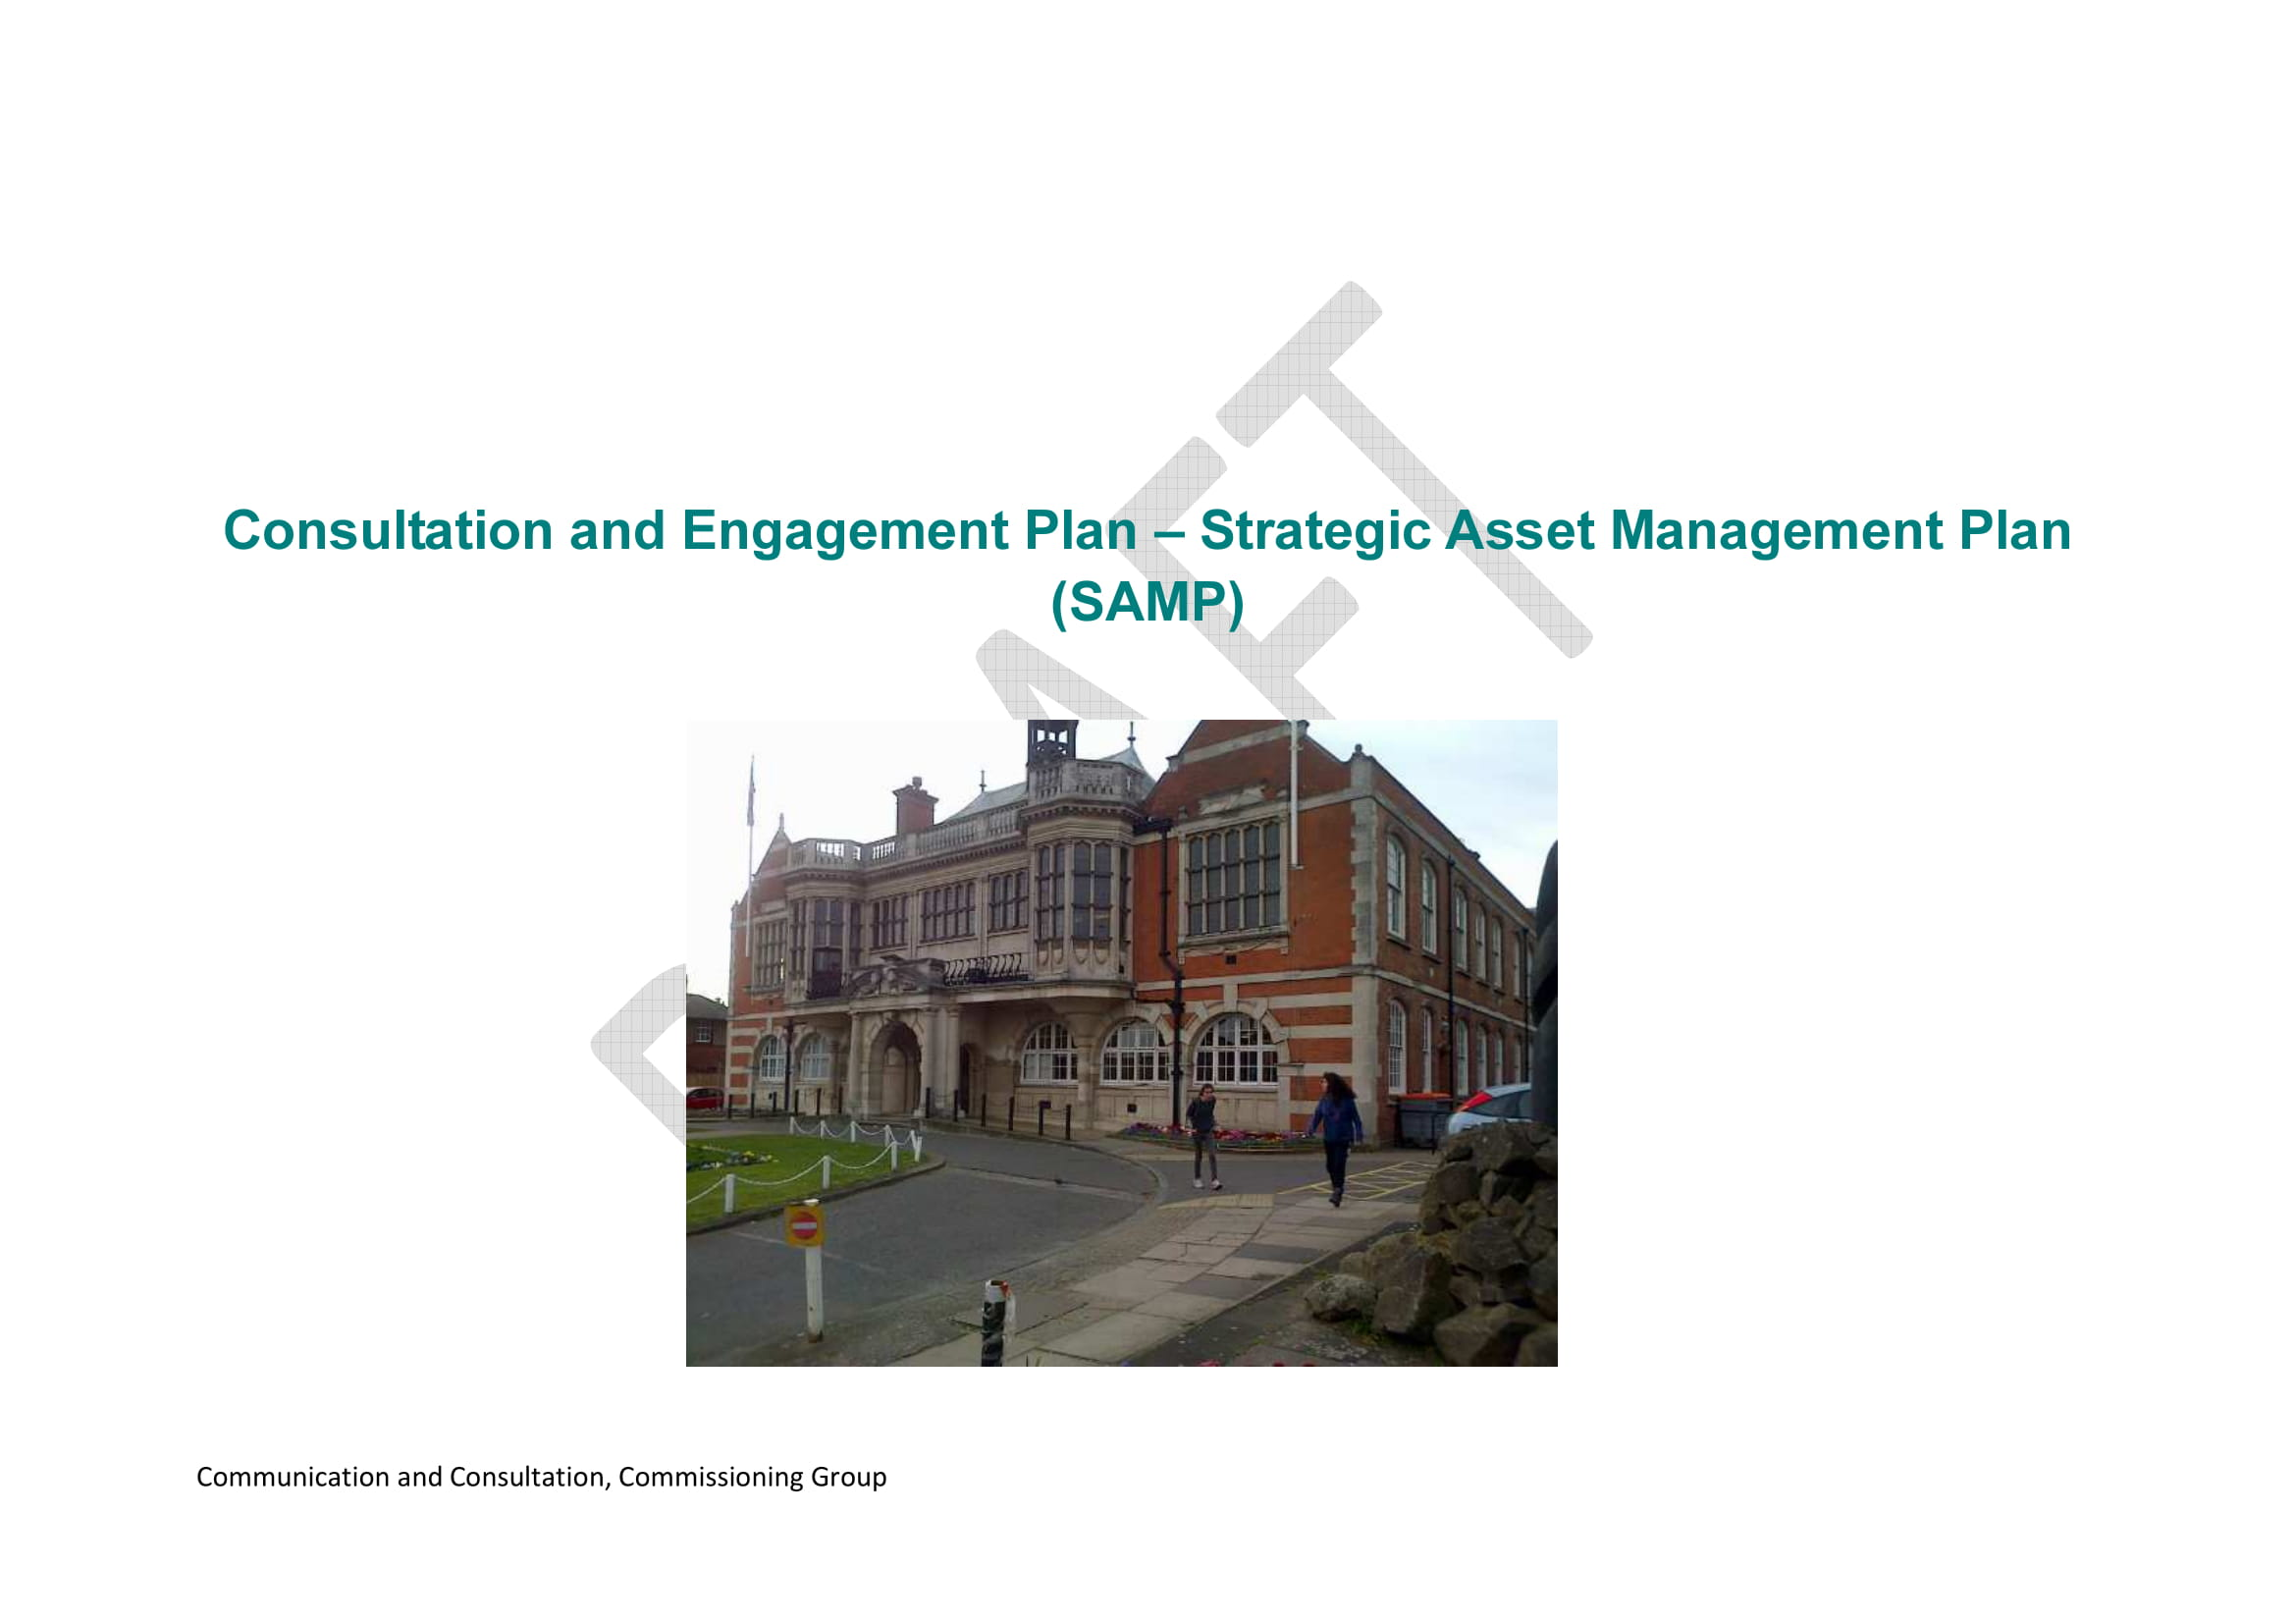 samp consultation plan